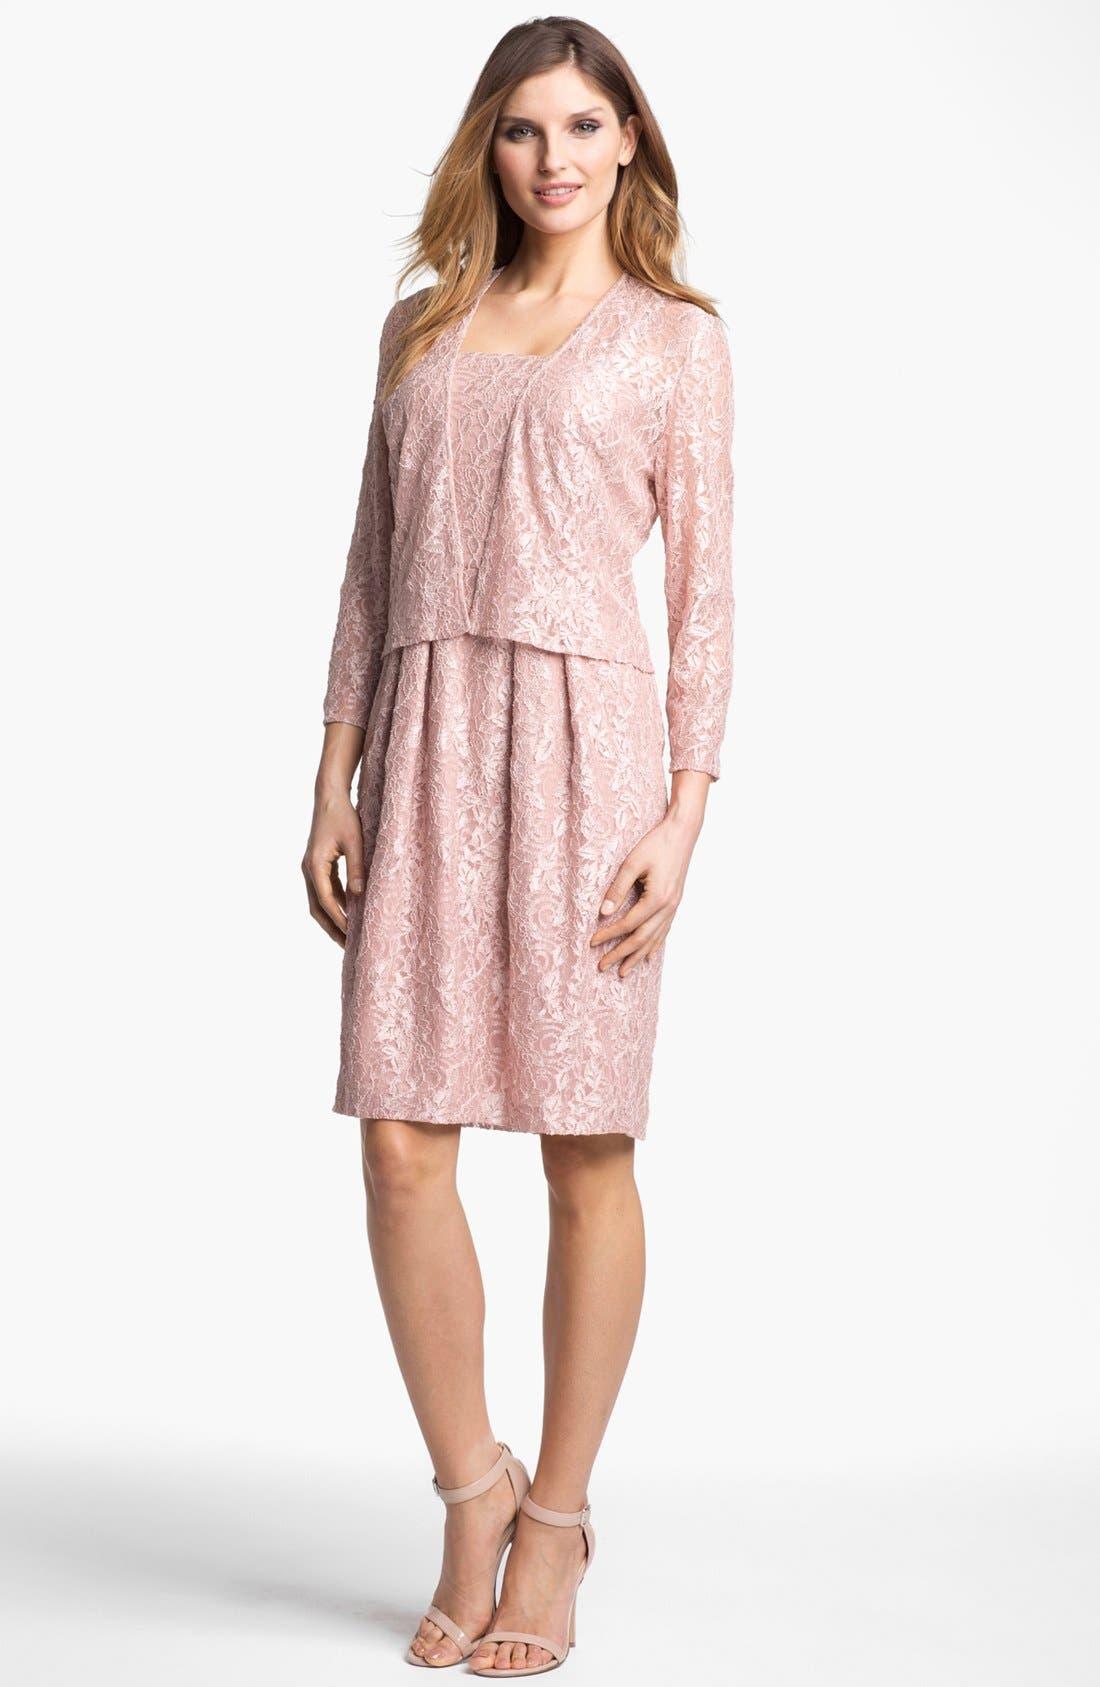 Alternate Image 1 Selected - Alex Evenings Lace Dress & Jacket